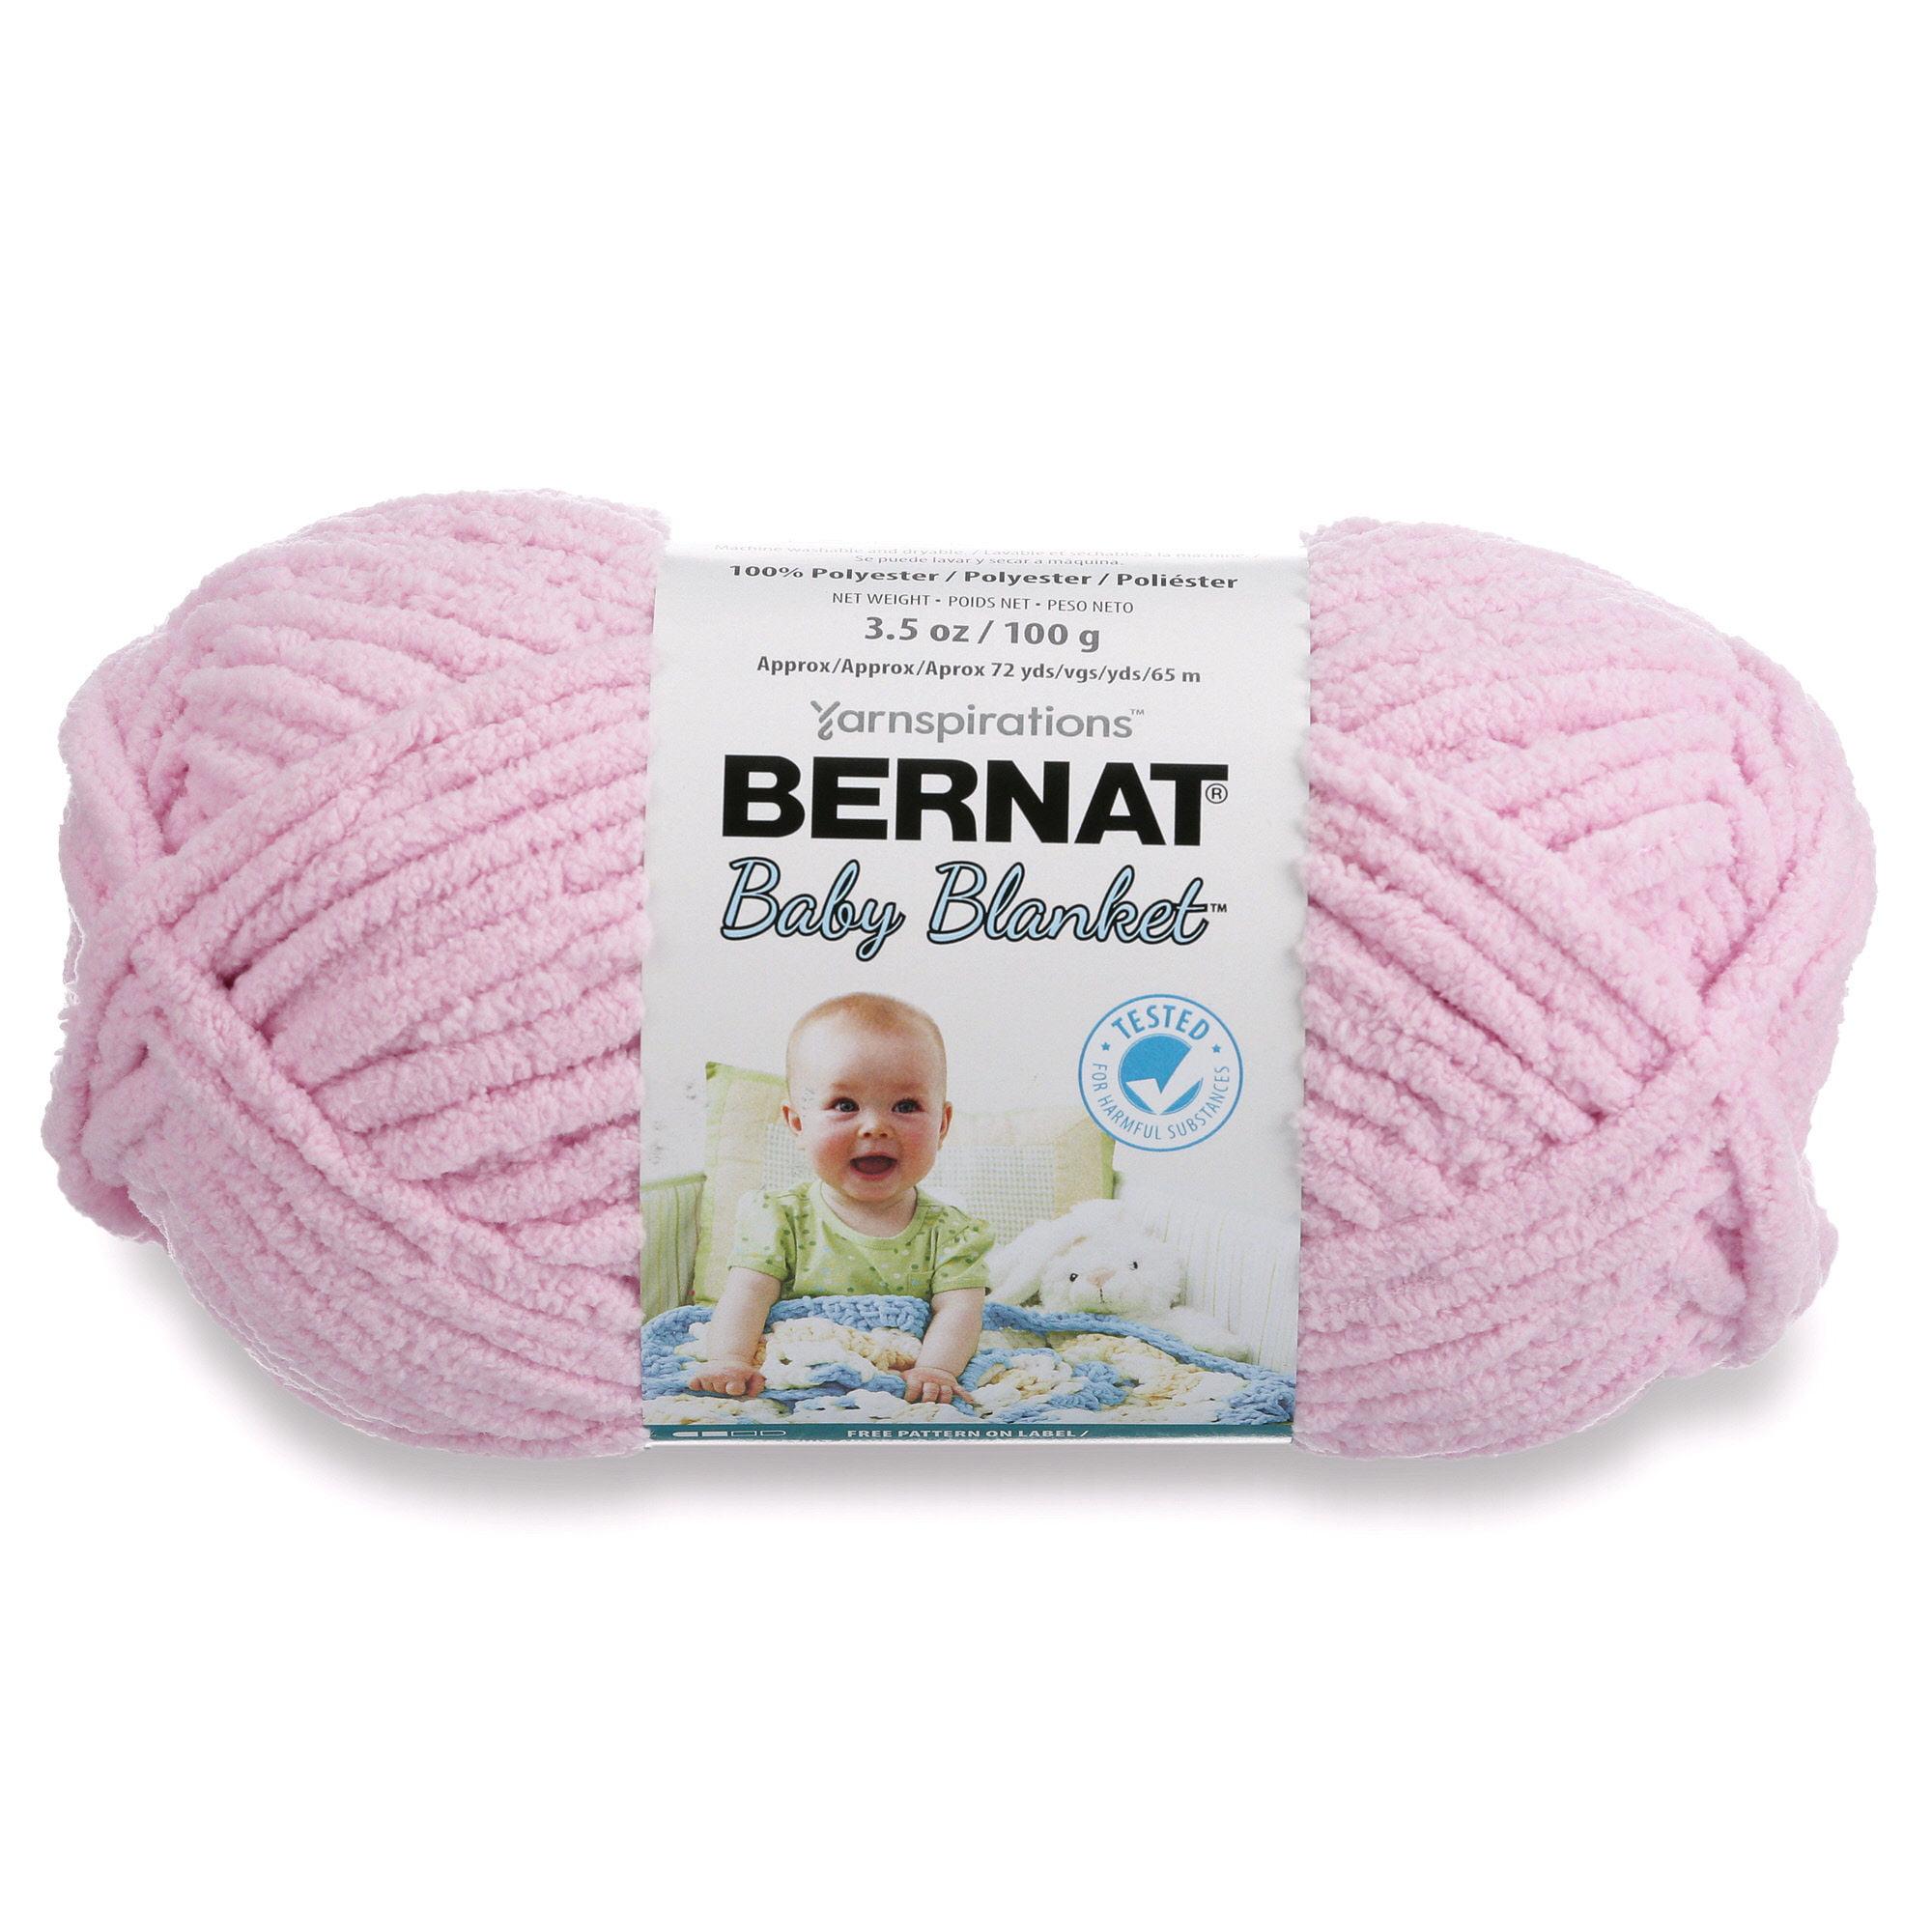 Bernat Baby Blanket Yarn (100g/3.5 oz), Lilac